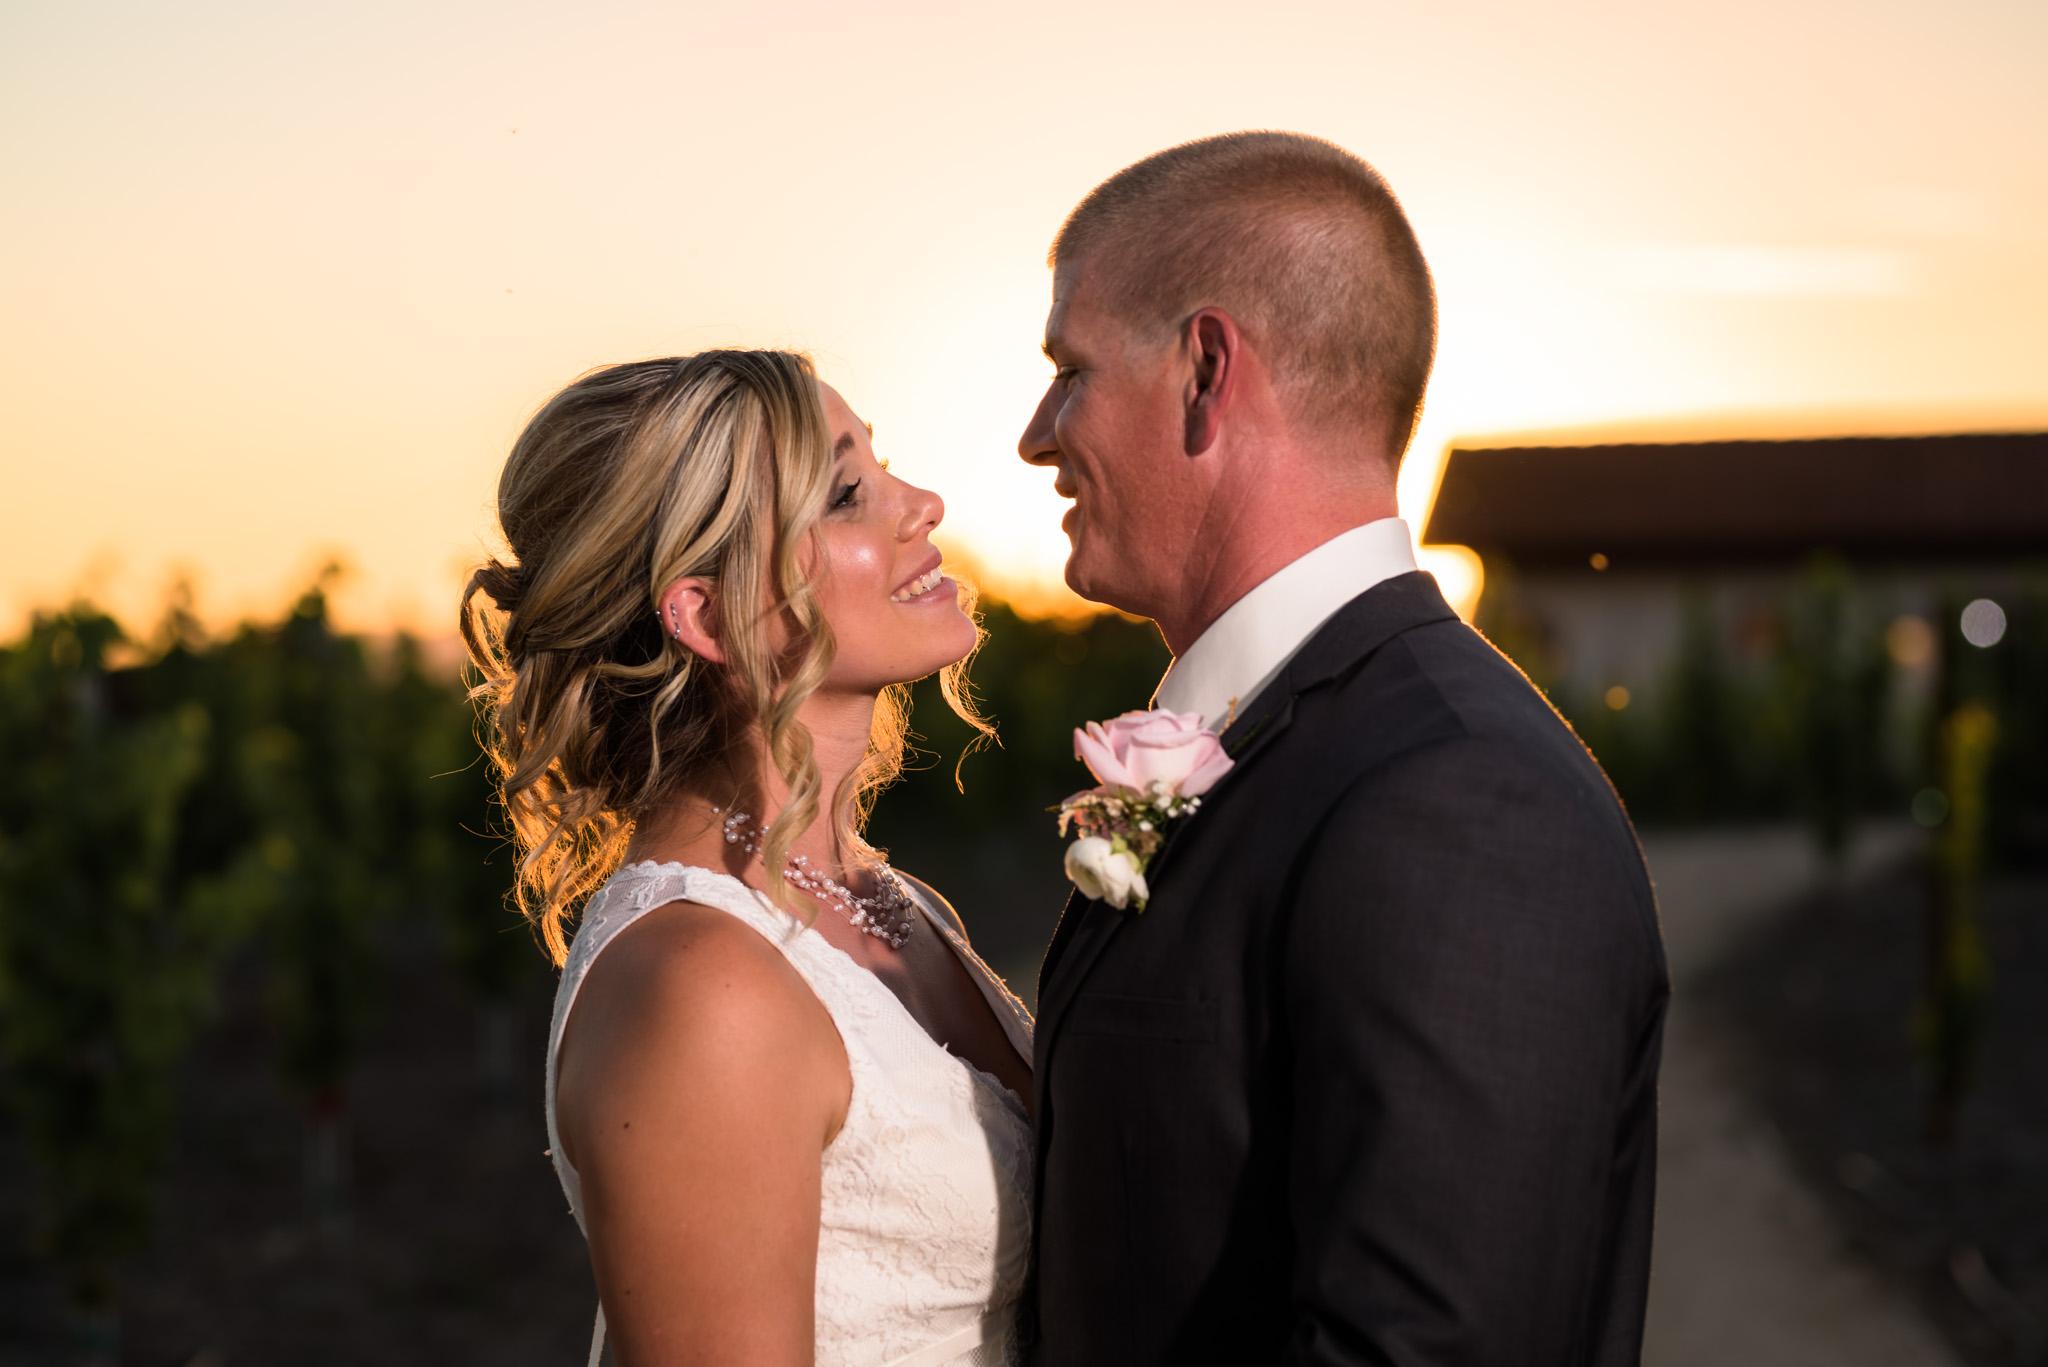 Avensole-Winery-Temecula-Wedding-Josh-and-Olivia-3808.JPG